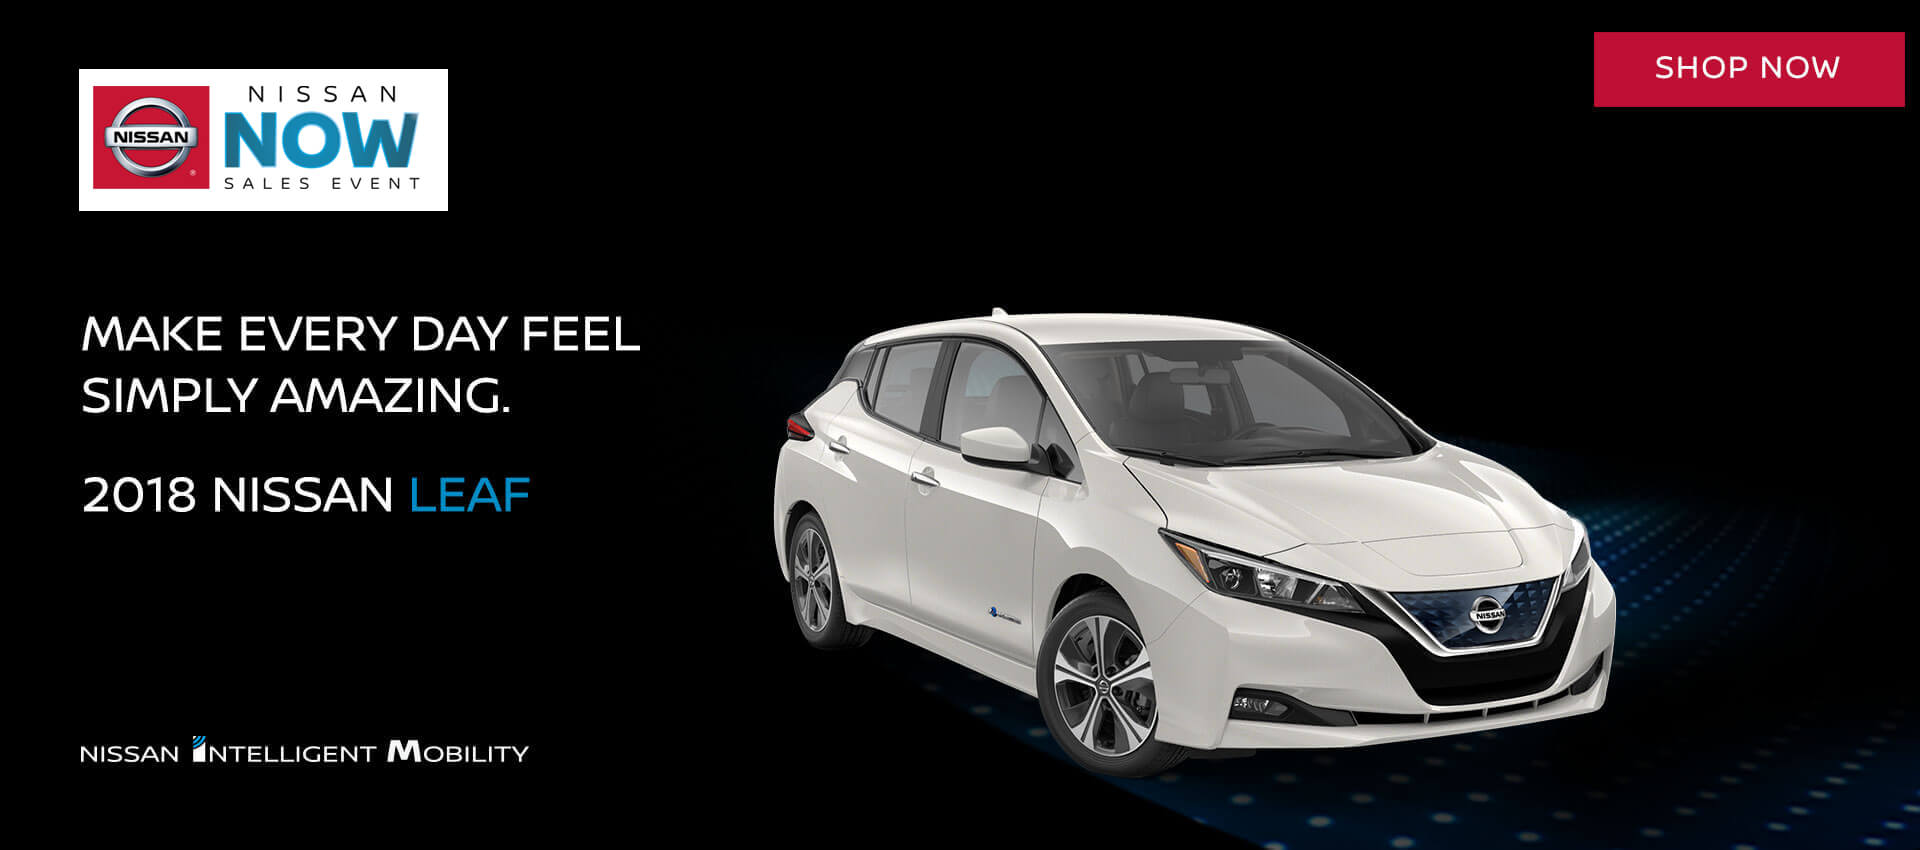 Nissan Now - Leaf